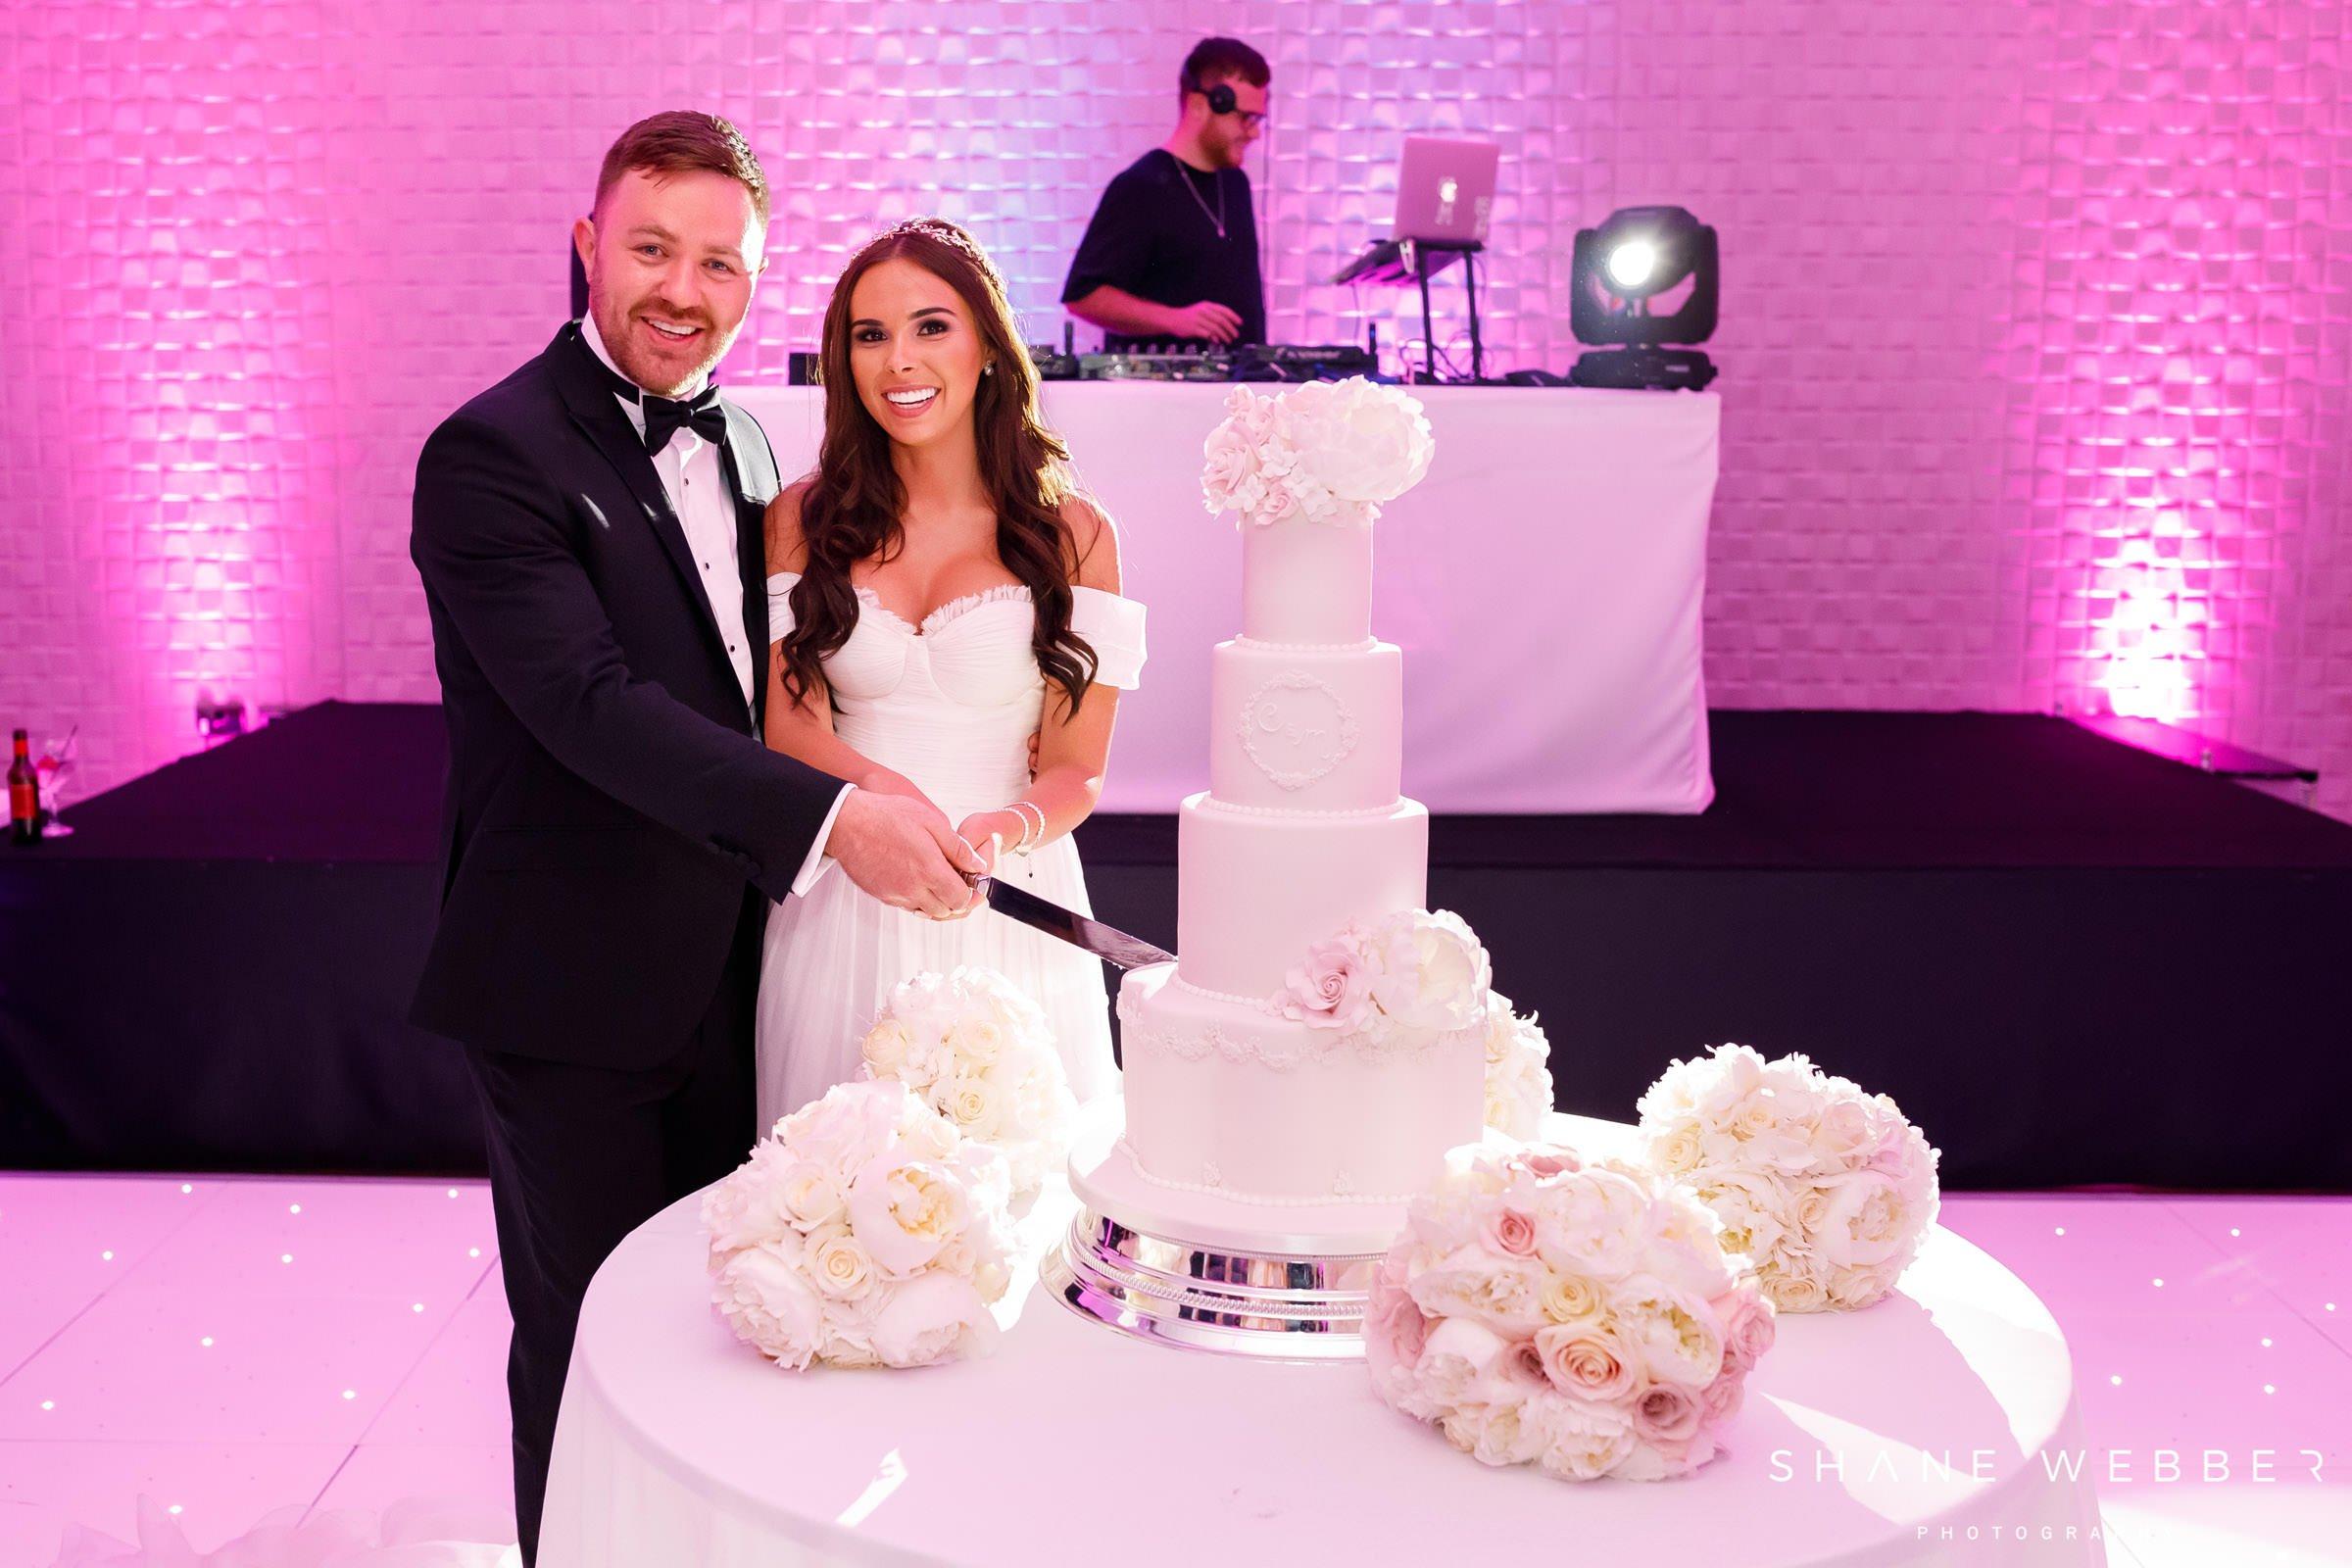 Cheshire wedding cakes Colshaw